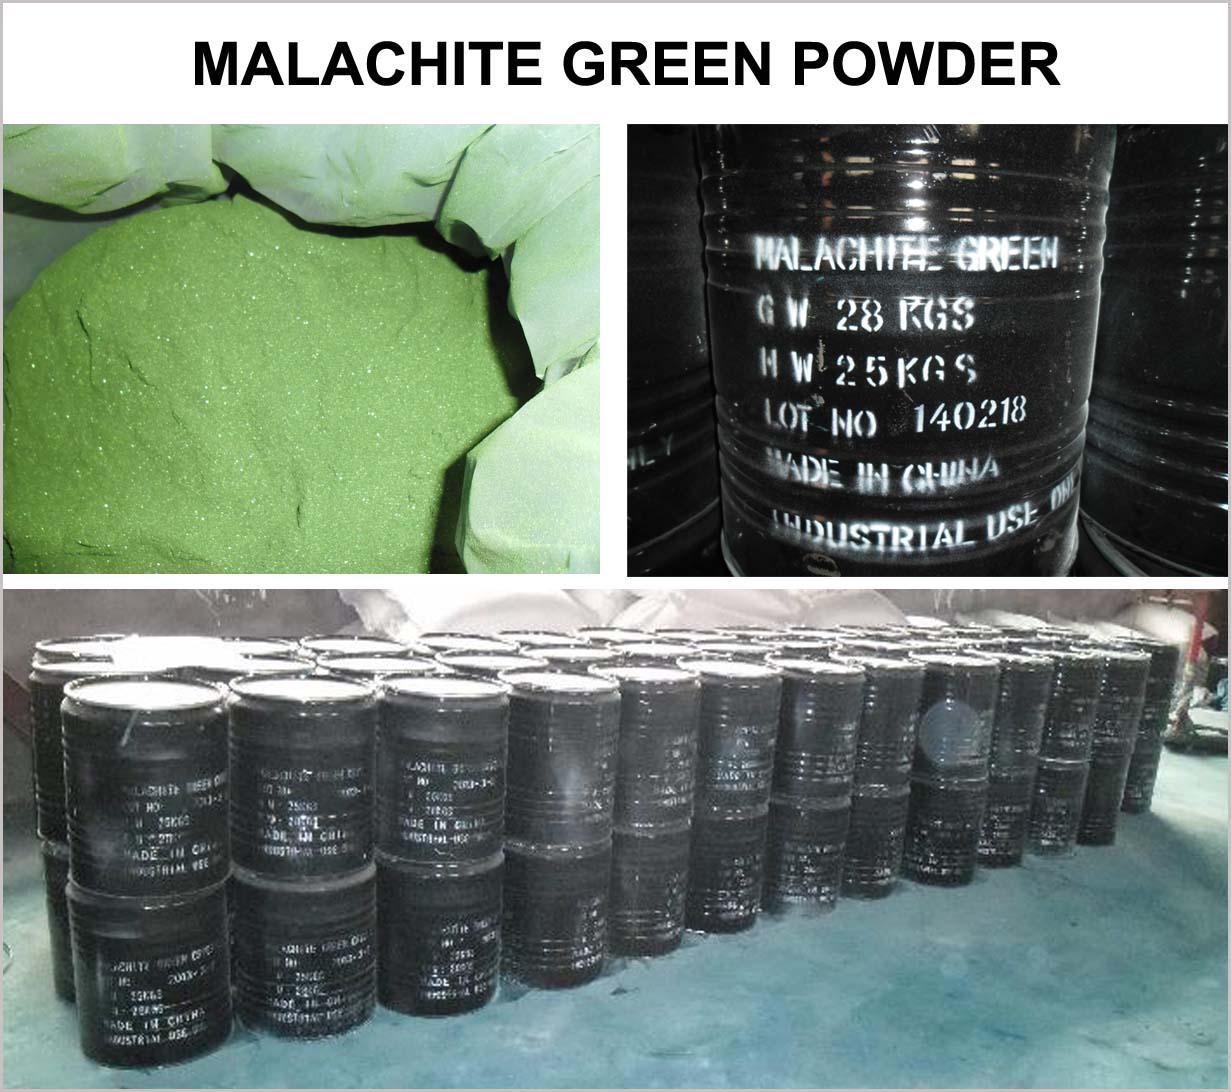 http://www.xcwydyes.com/malachite-green-crystal.html